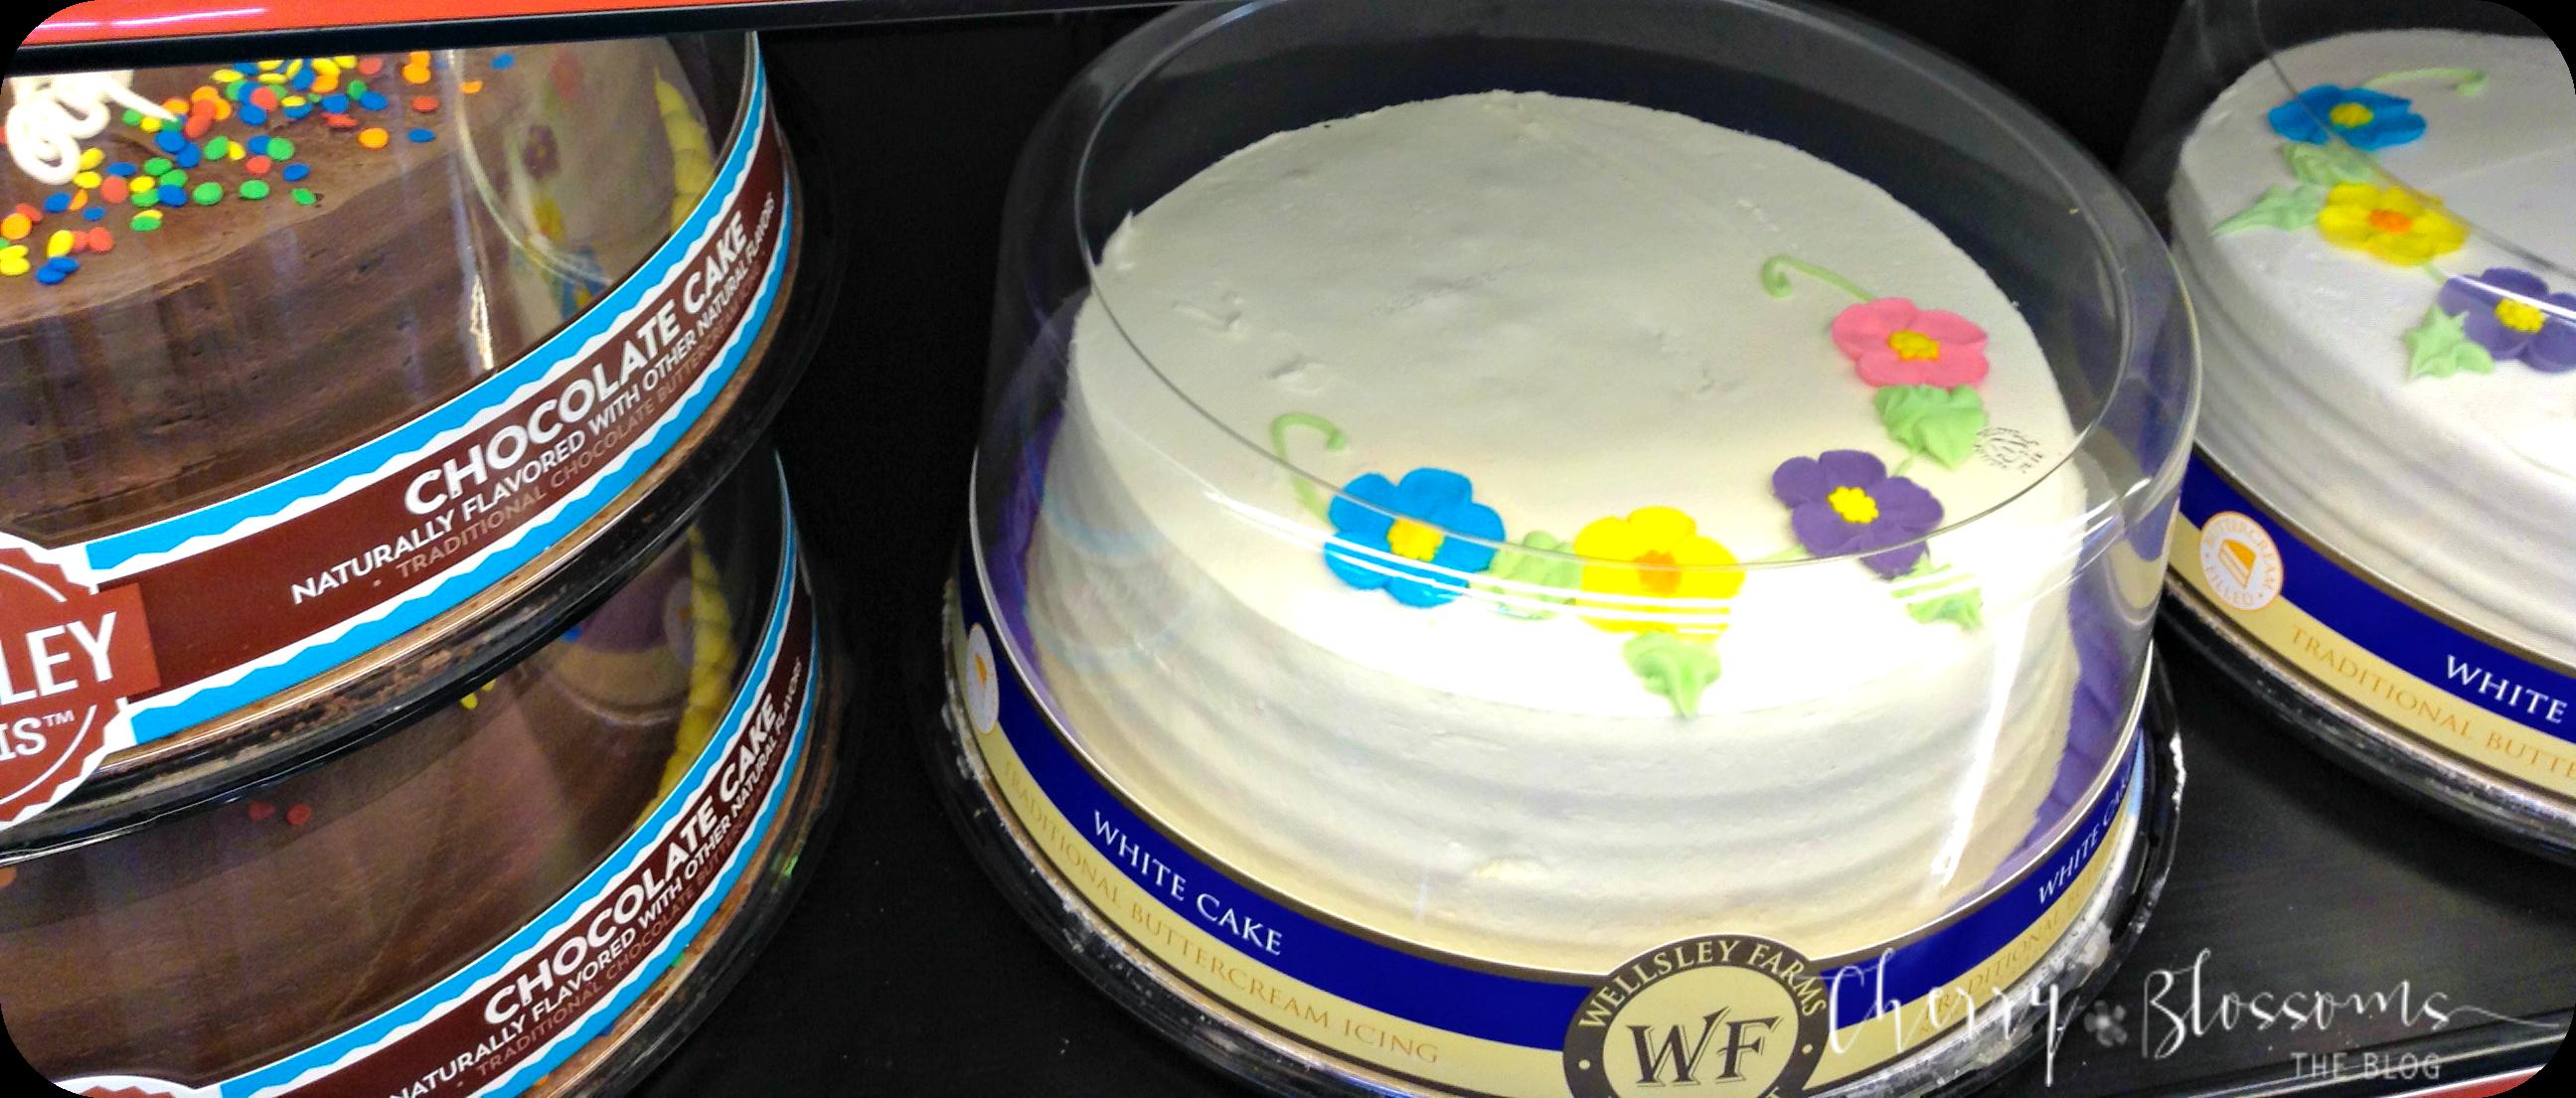 Admirable 13 Musical Theme Birthday Cakes Bjs Photo Minion Birthday Cake Birthday Cards Printable Opercafe Filternl